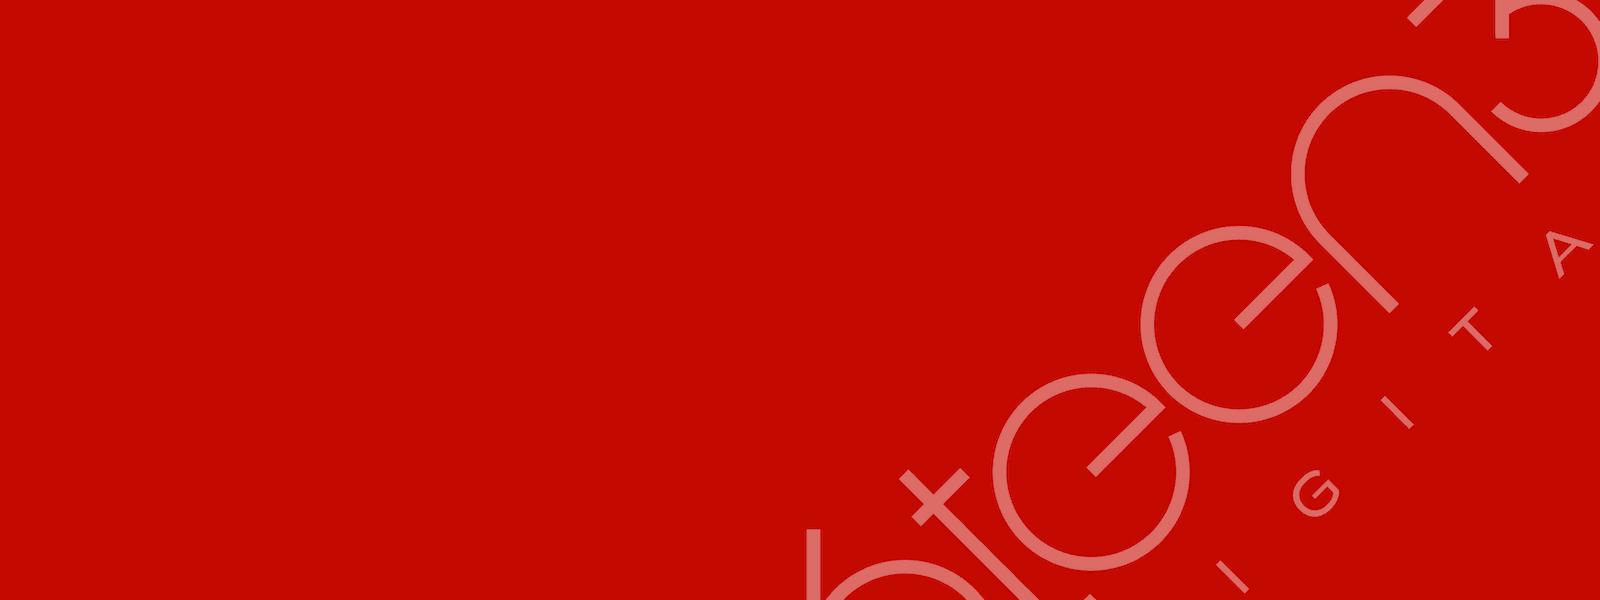 Website Headers_6t30 - Red 7